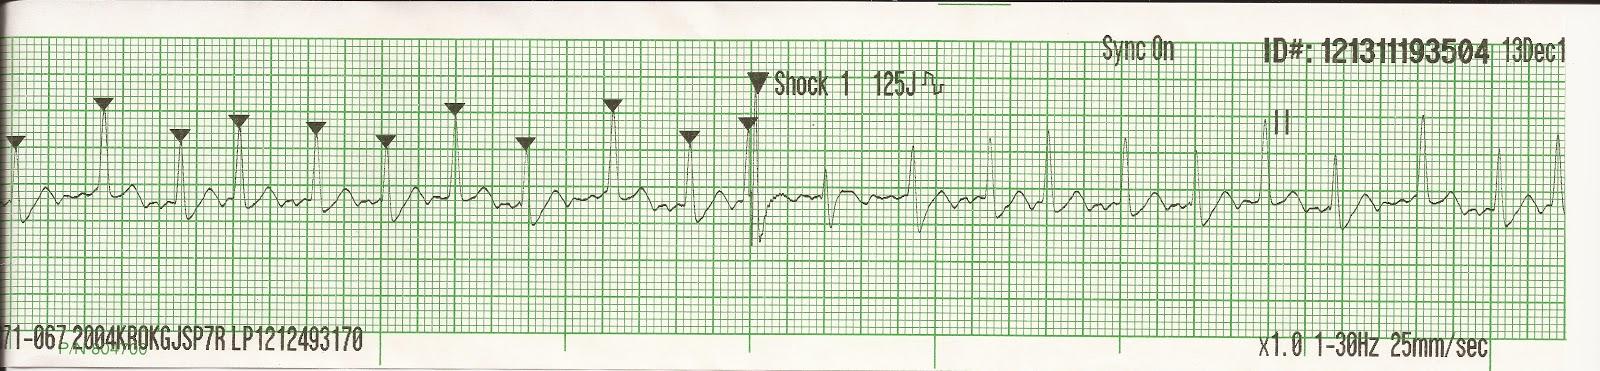 Atrial Fibrillation Strip